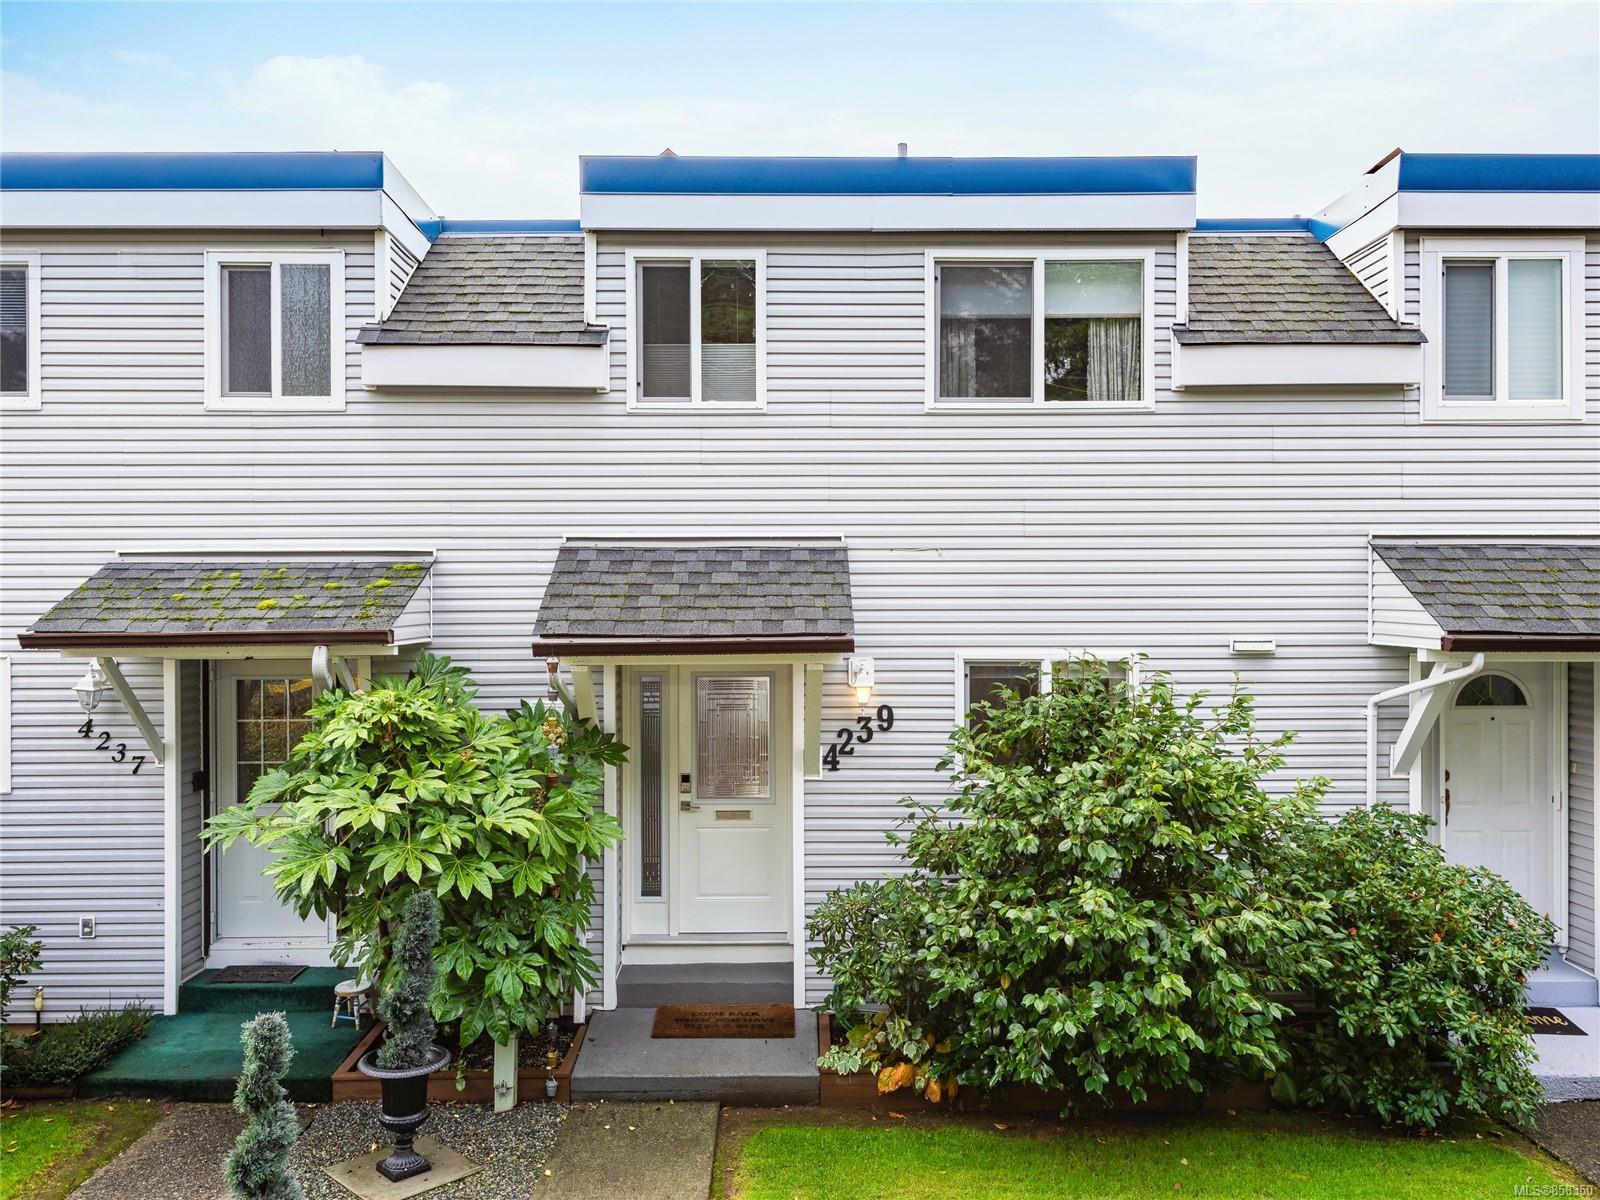 Main Photo: 4239 8th Ave in : PA Port Alberni Row/Townhouse for sale (Port Alberni)  : MLS®# 858350